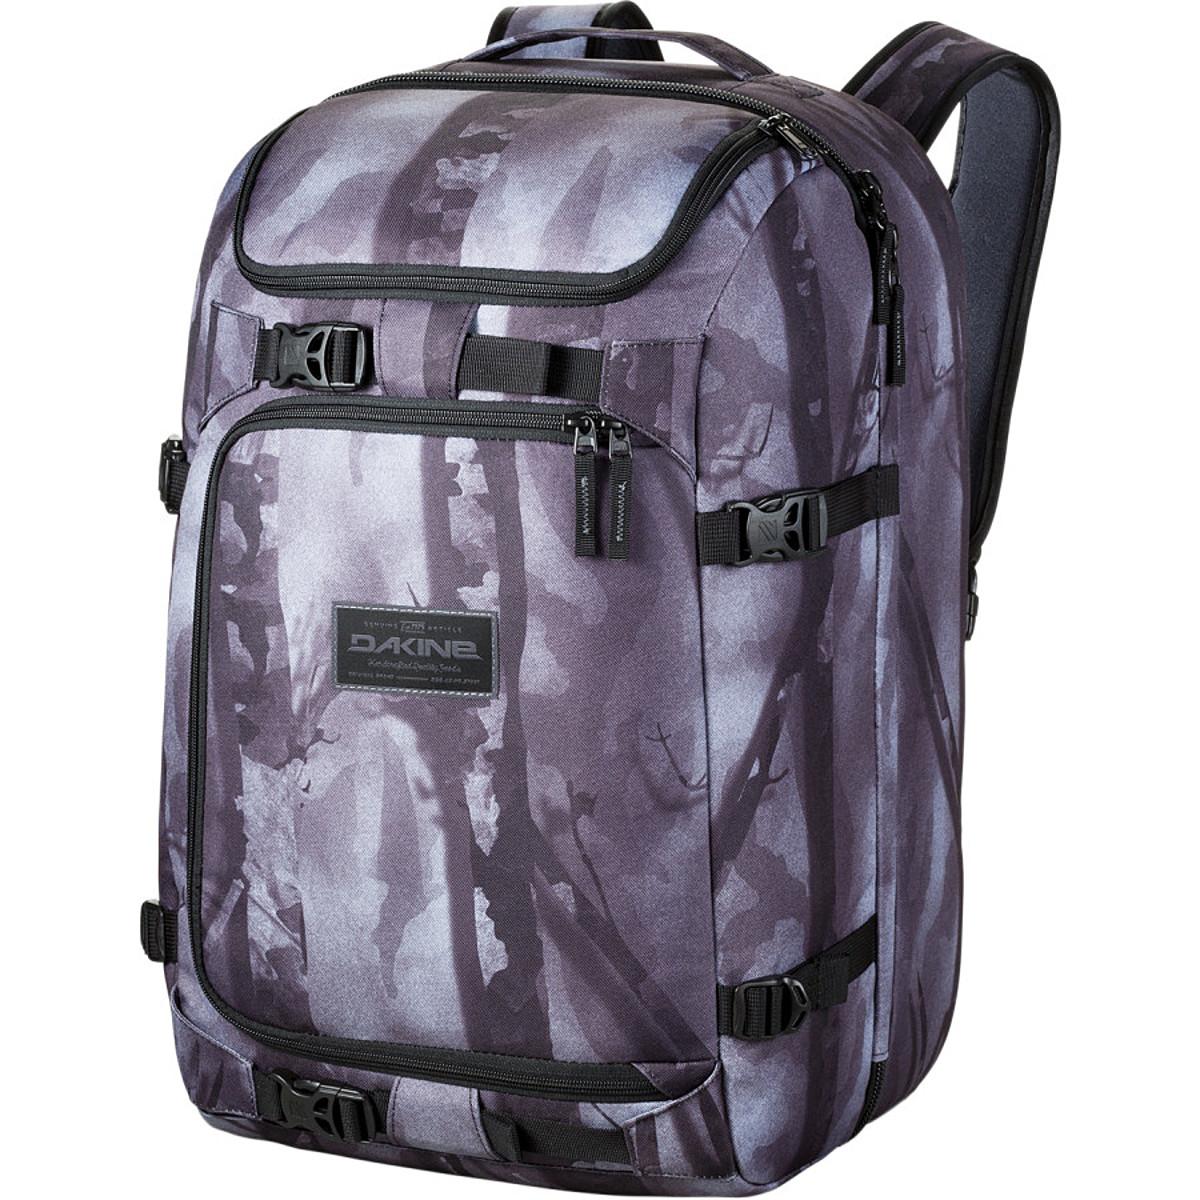 DaKine DLX Cargo Pack 55L